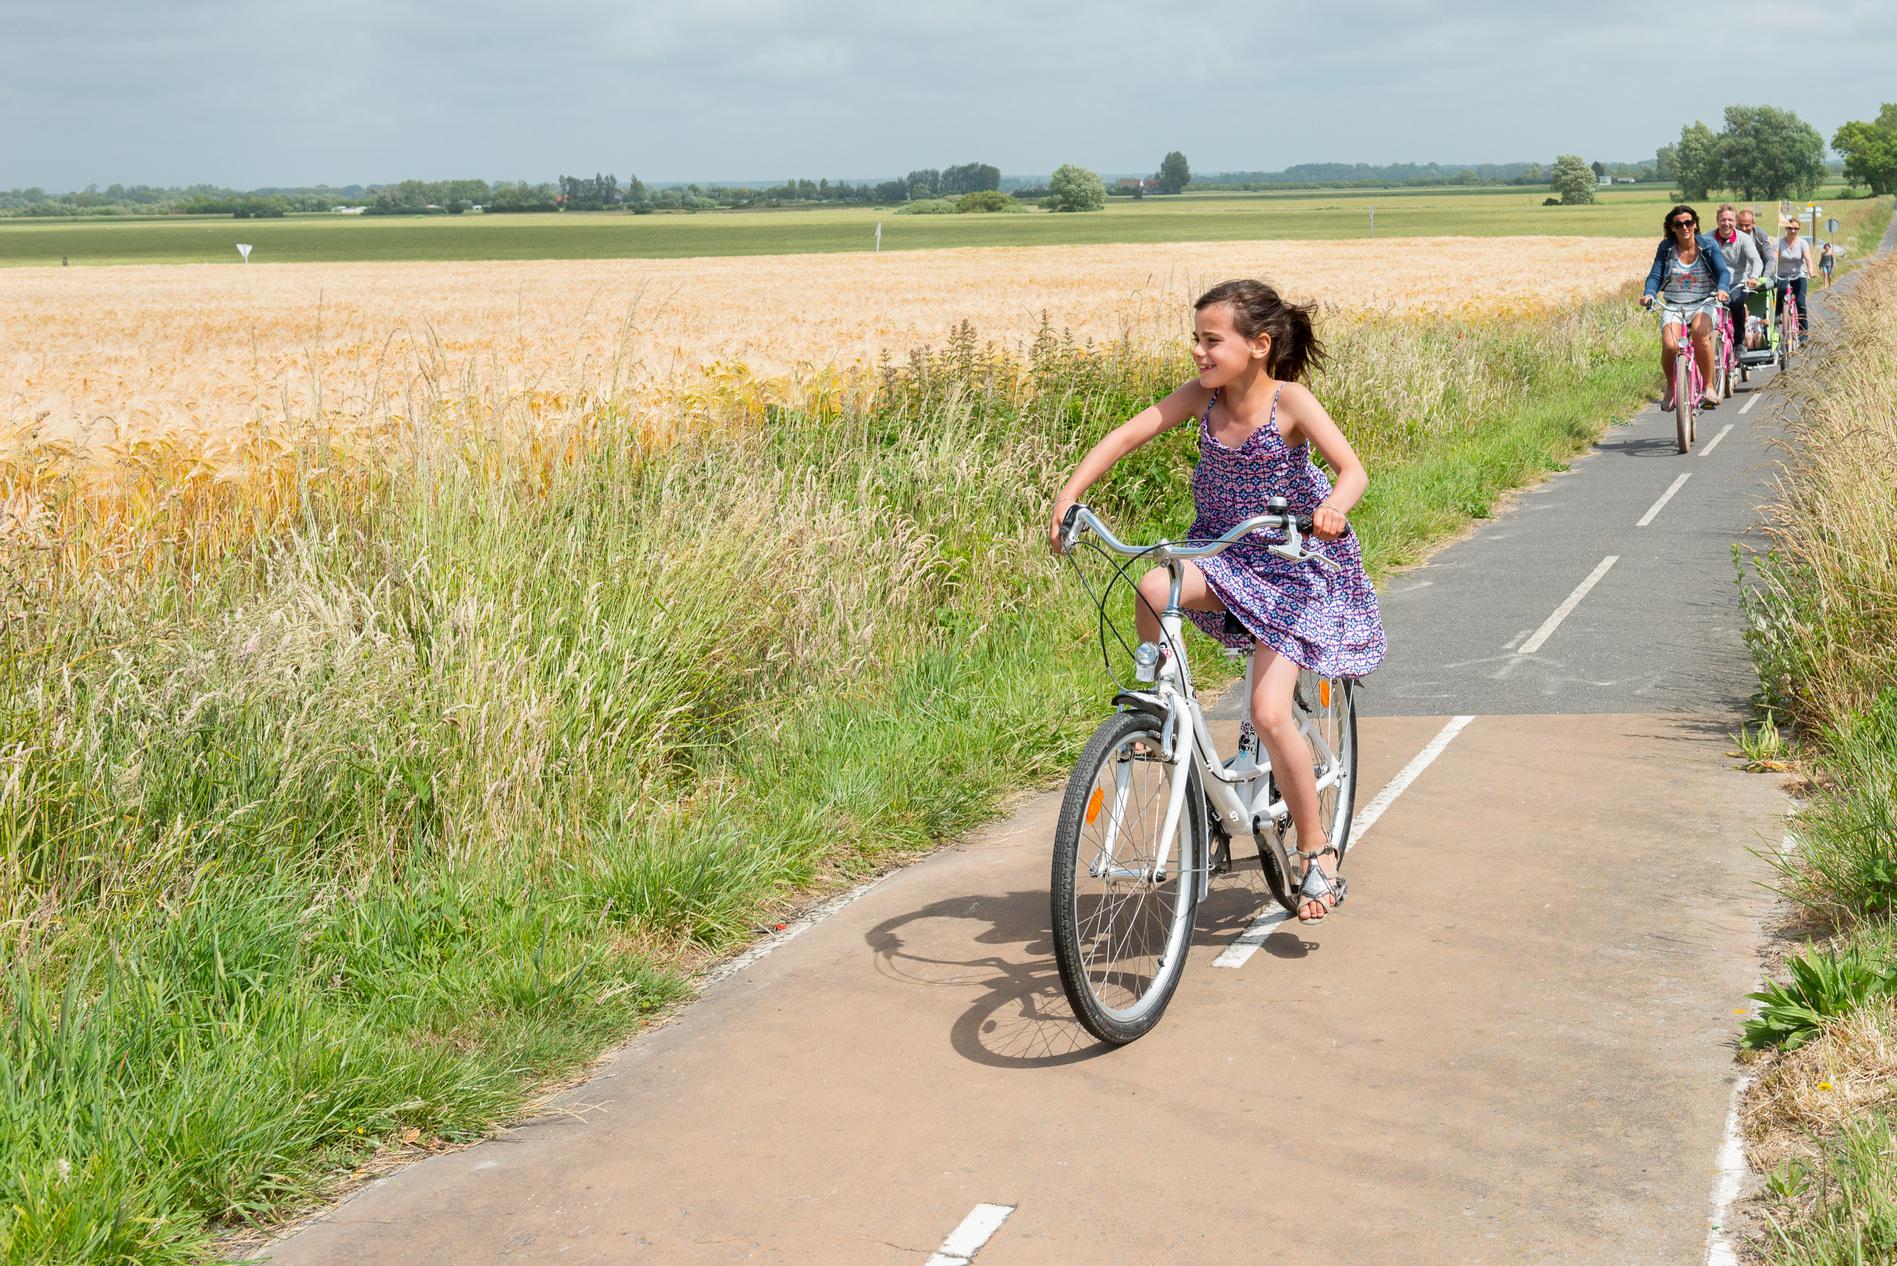 Frankrijk-Le%20Crotoy-Flowercamping%20Les%20Aubepines-ExtraLarge Wintersport Frankrijk